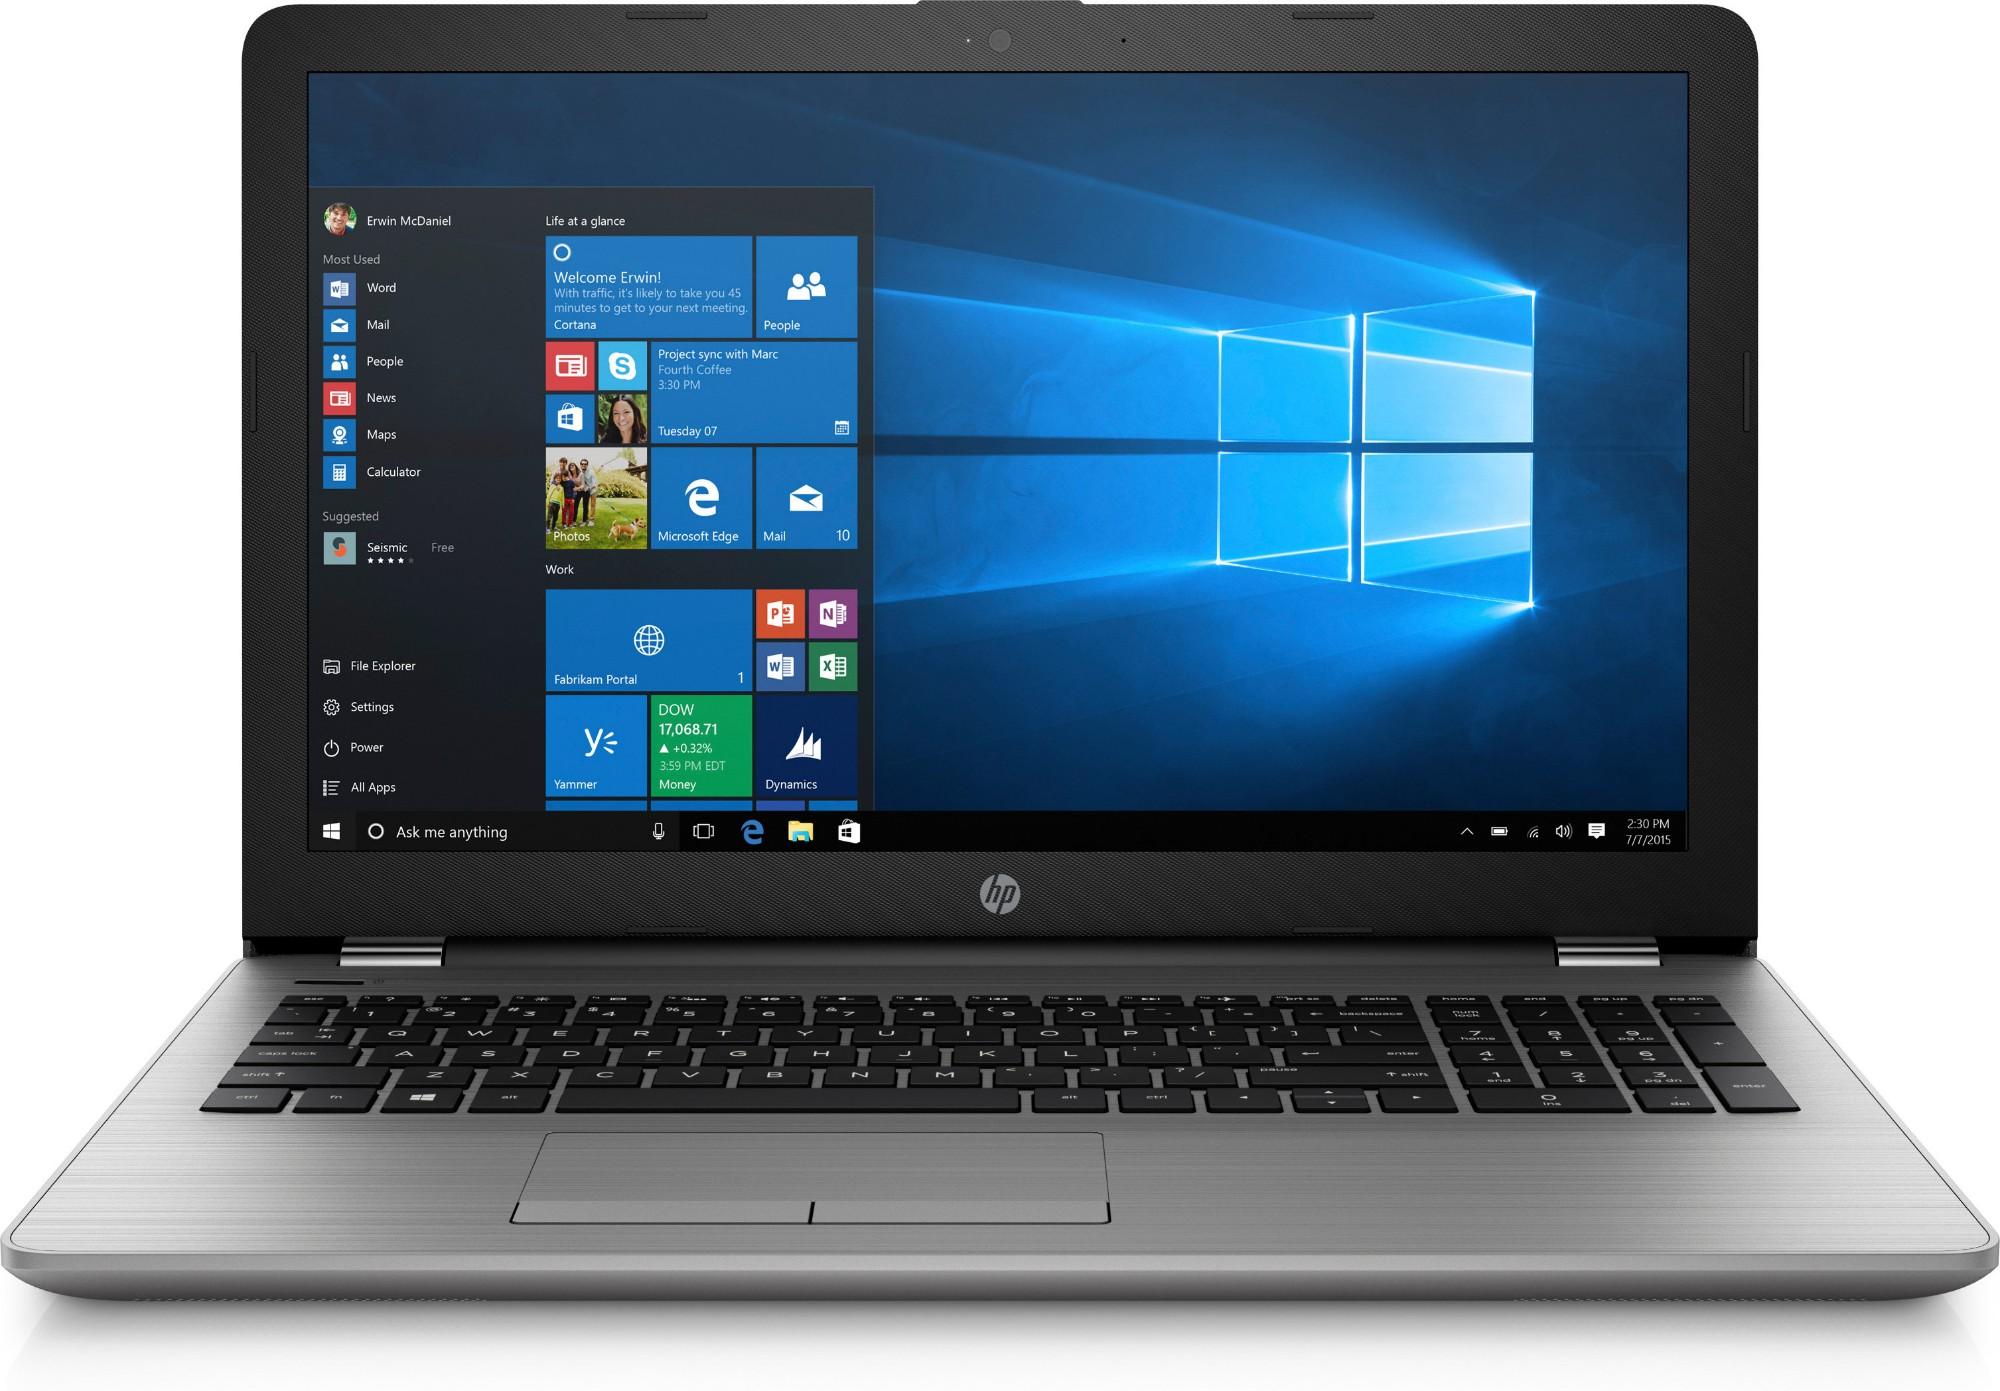 HP 250 G6 2.50GHz i5-7200U 7th gen Intel® Core™ i5 15.6